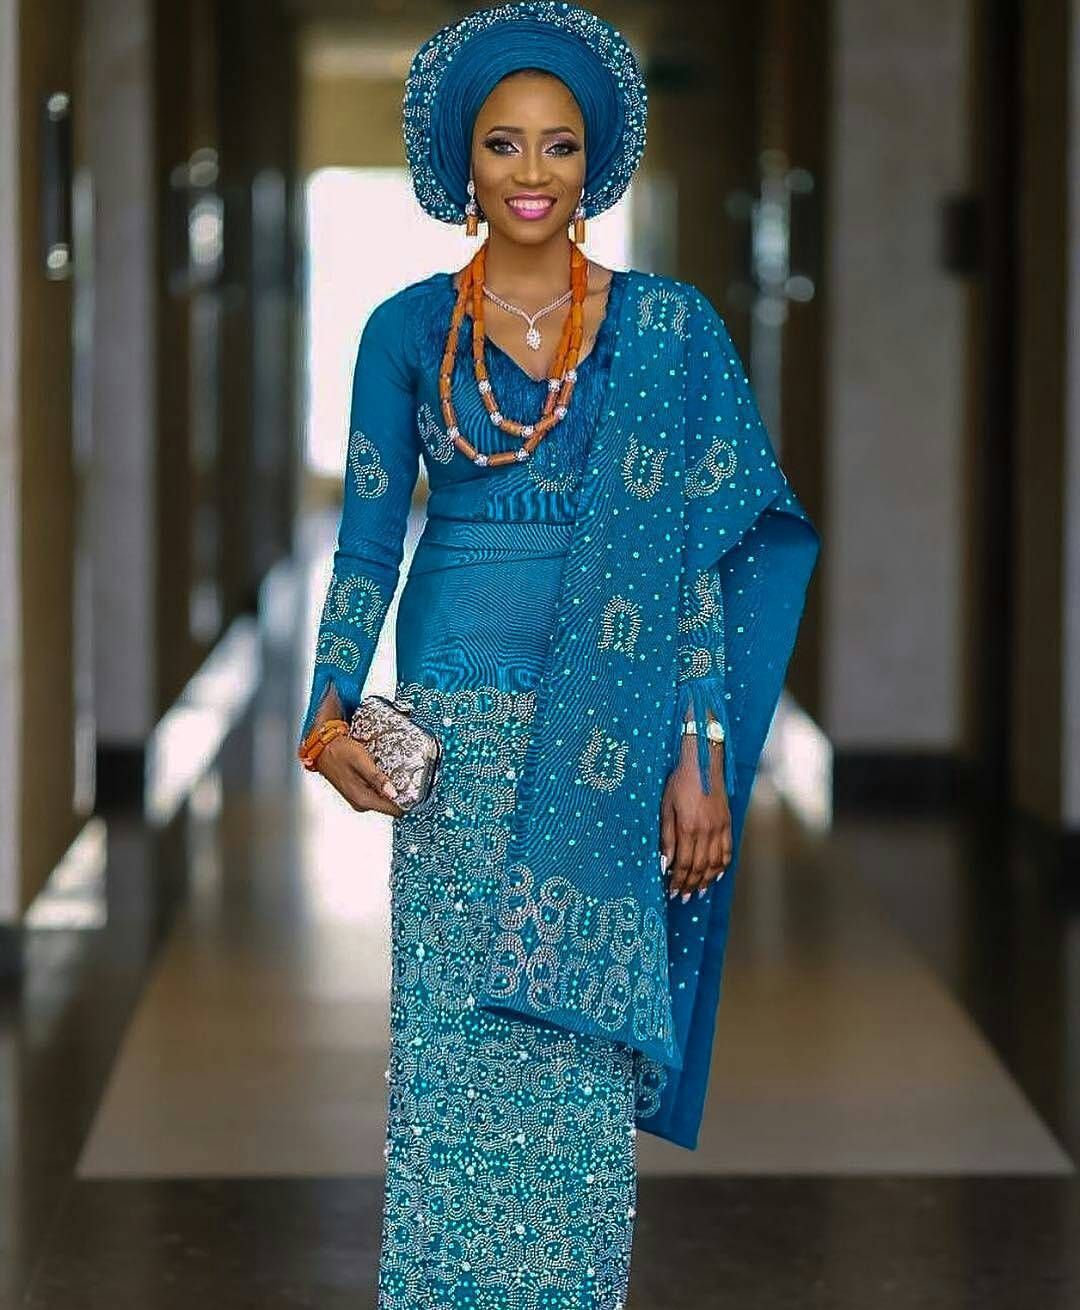 Gorgeous bride kanyinalakija beads by mzoludee photography